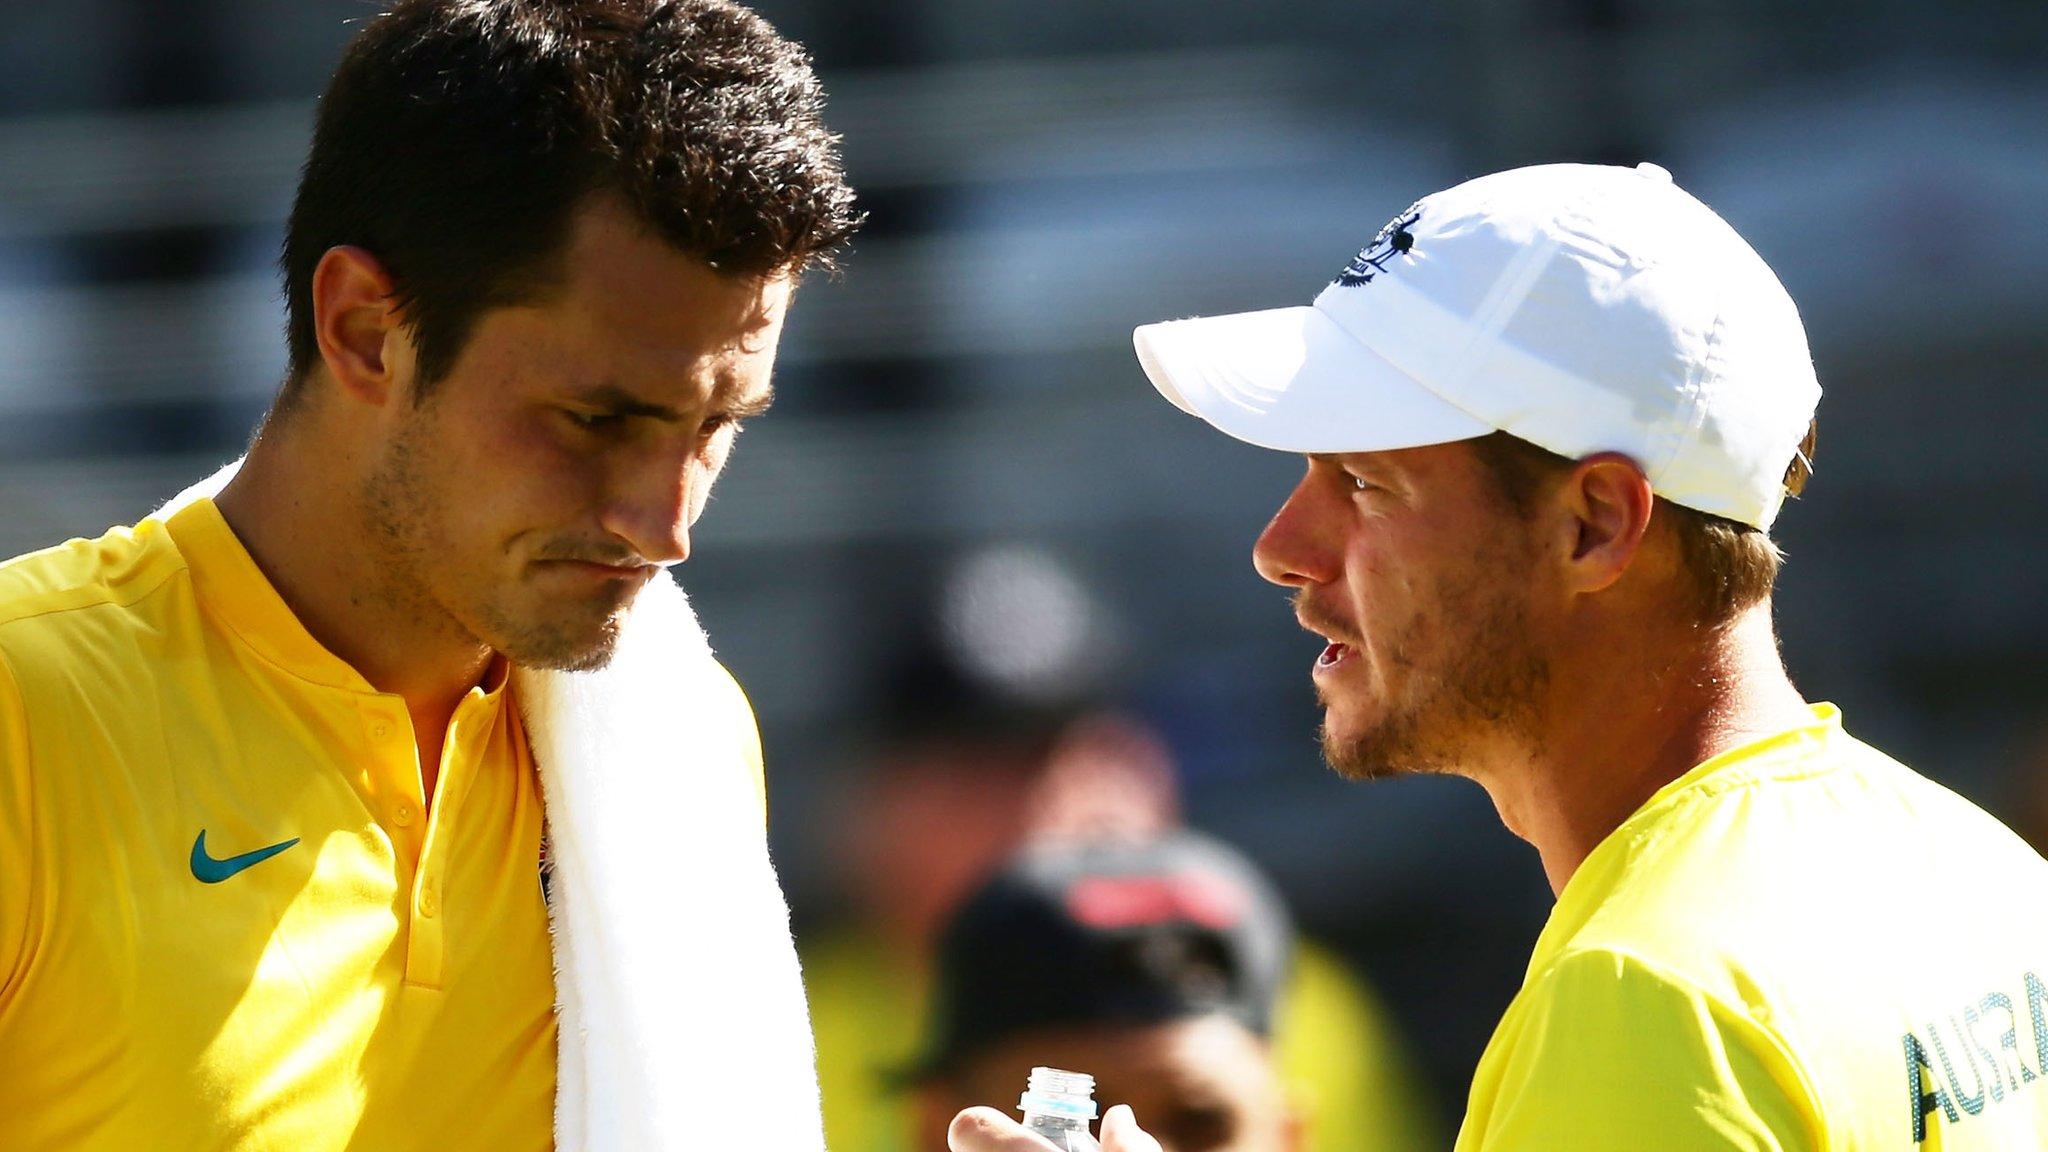 Bernard Tomic calls Lleyton Hewitt 'liar' over claims he threatened Davis Cup captain